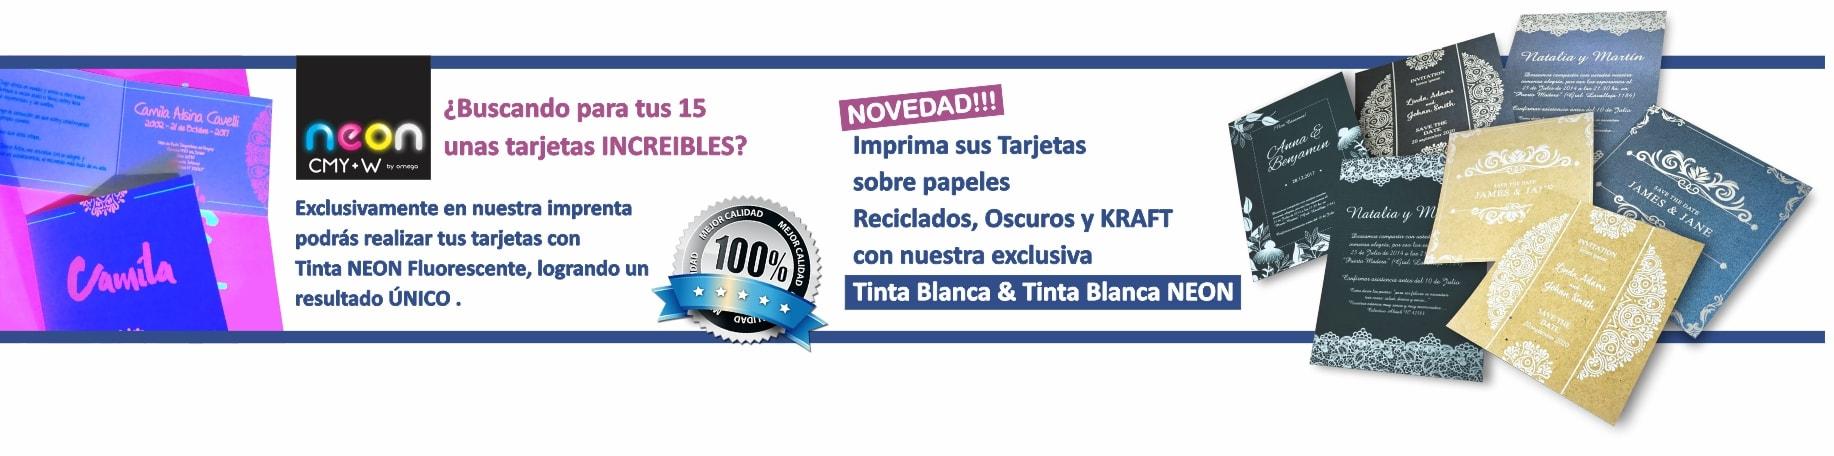 Imprenta Omega Industrias Gráficas Tarjetas De